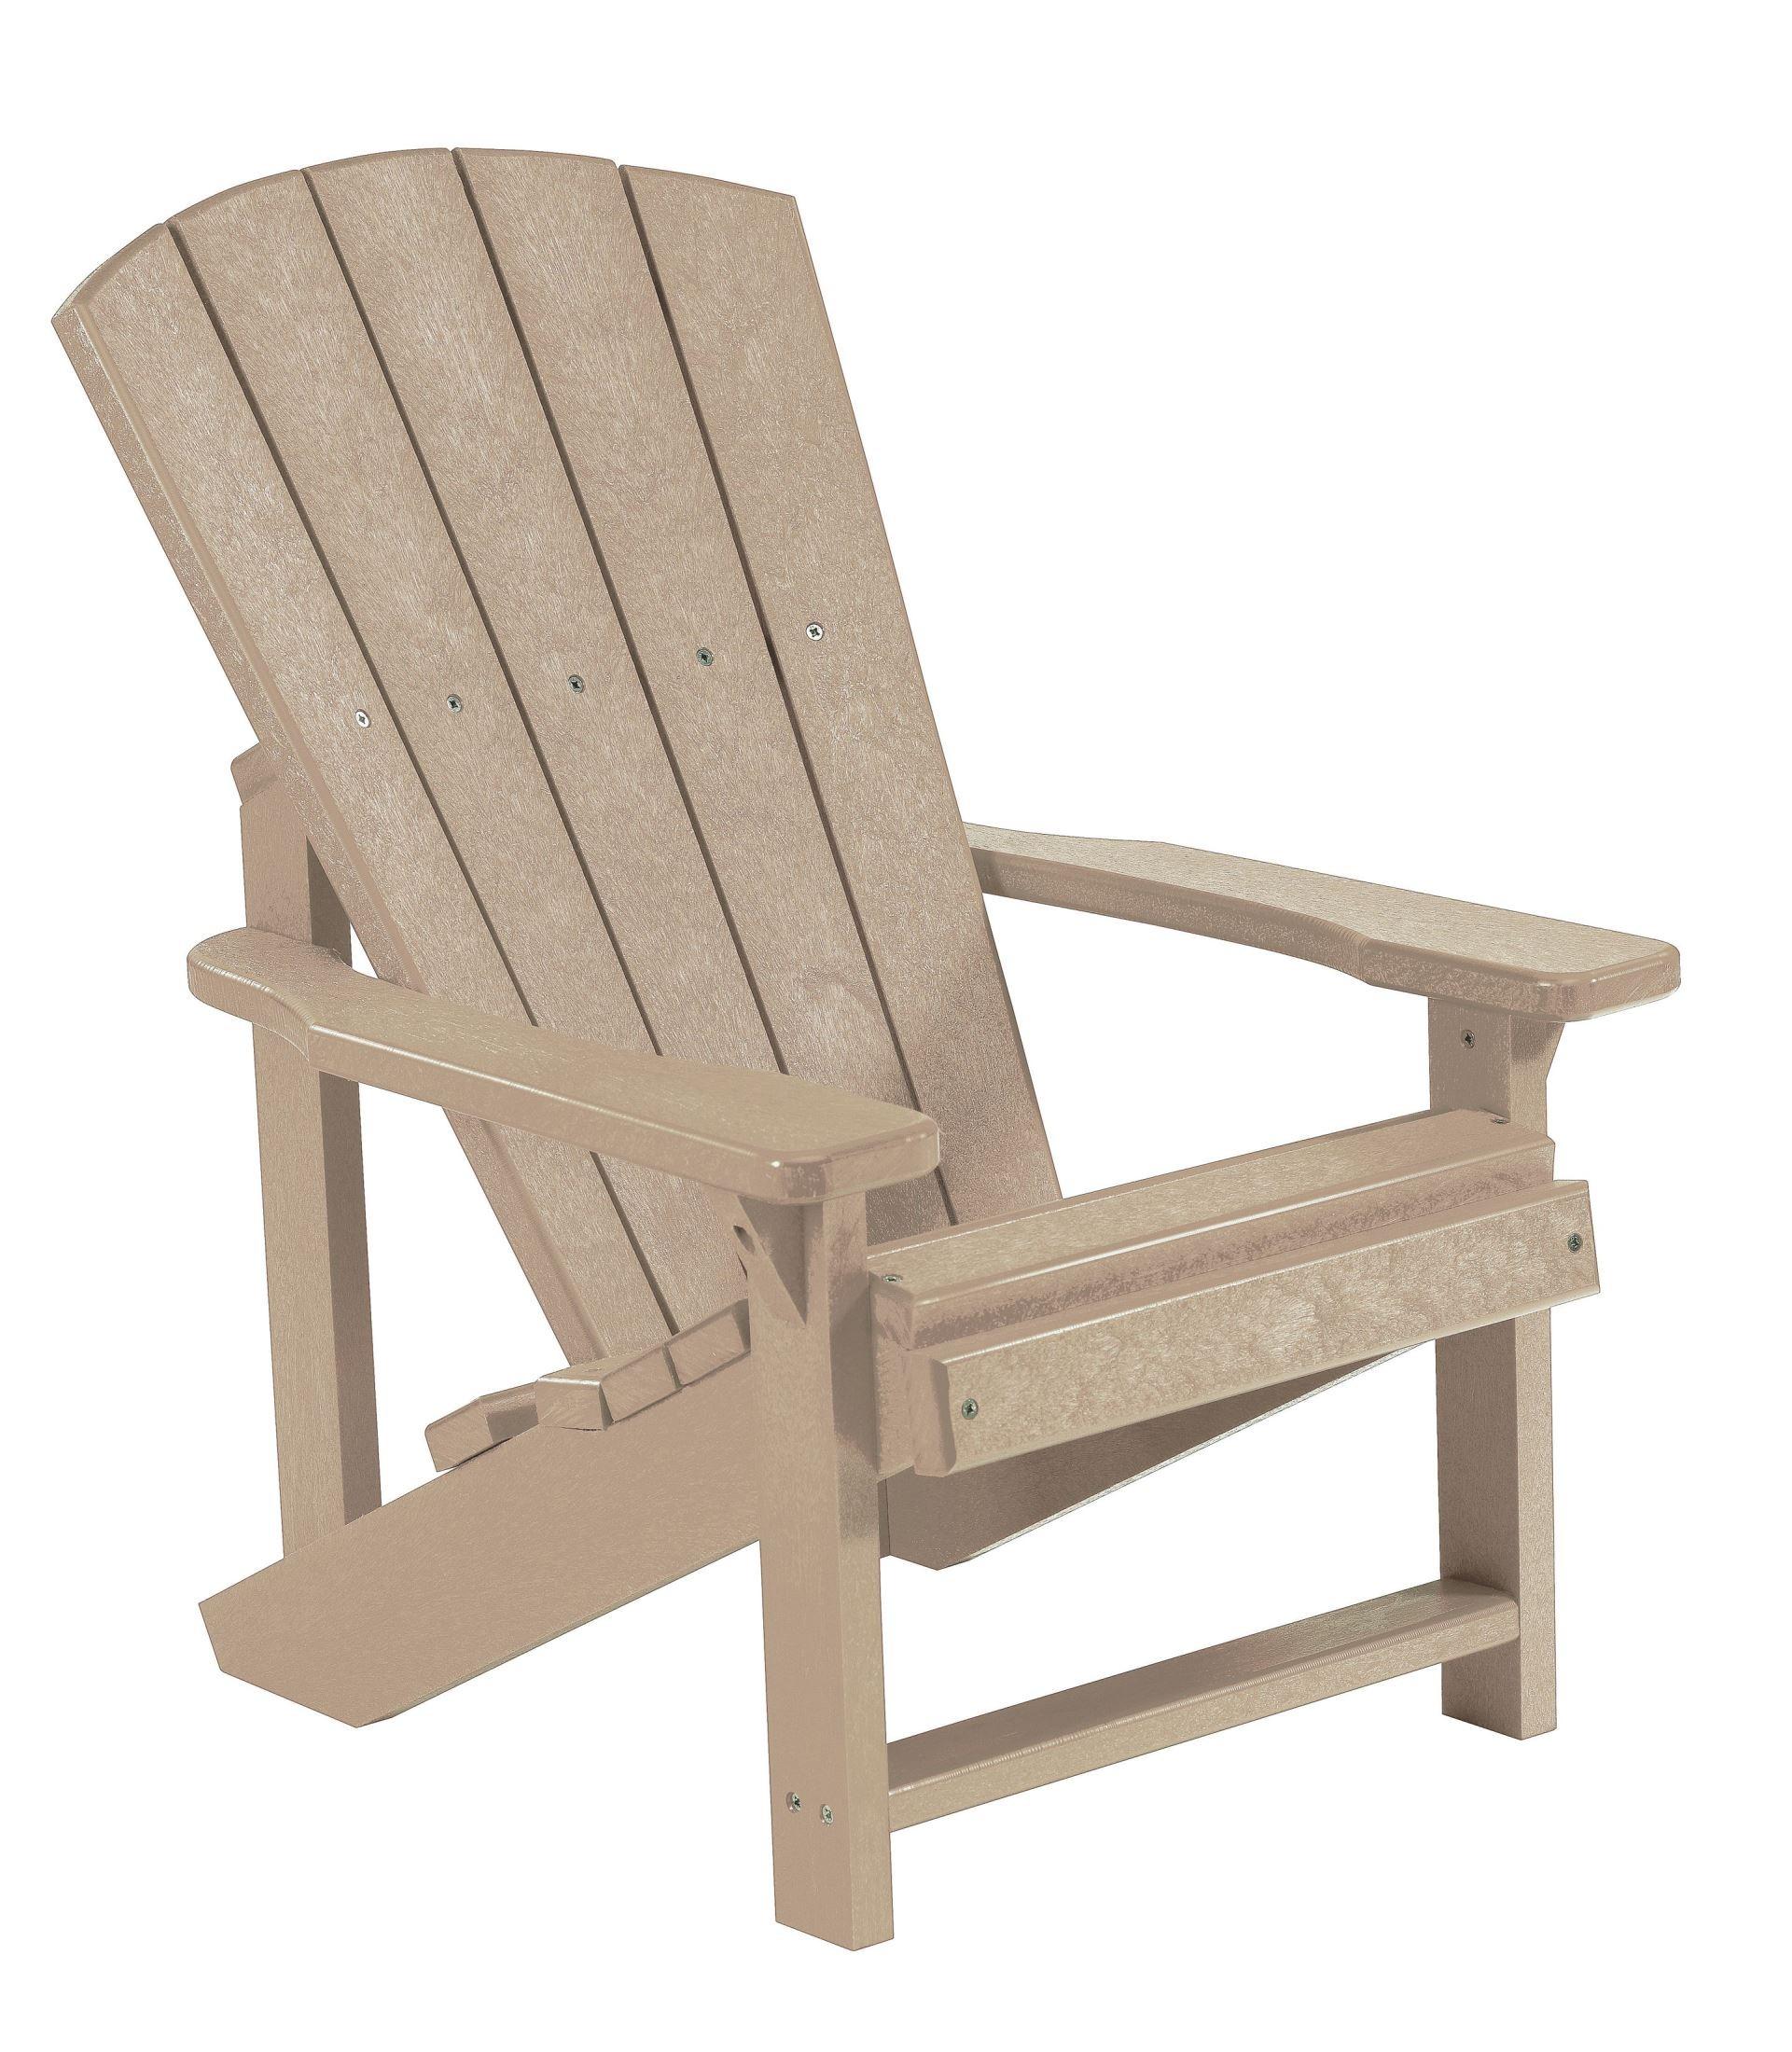 Generations Beige Kids Adirondack Chair From Cr Plastic